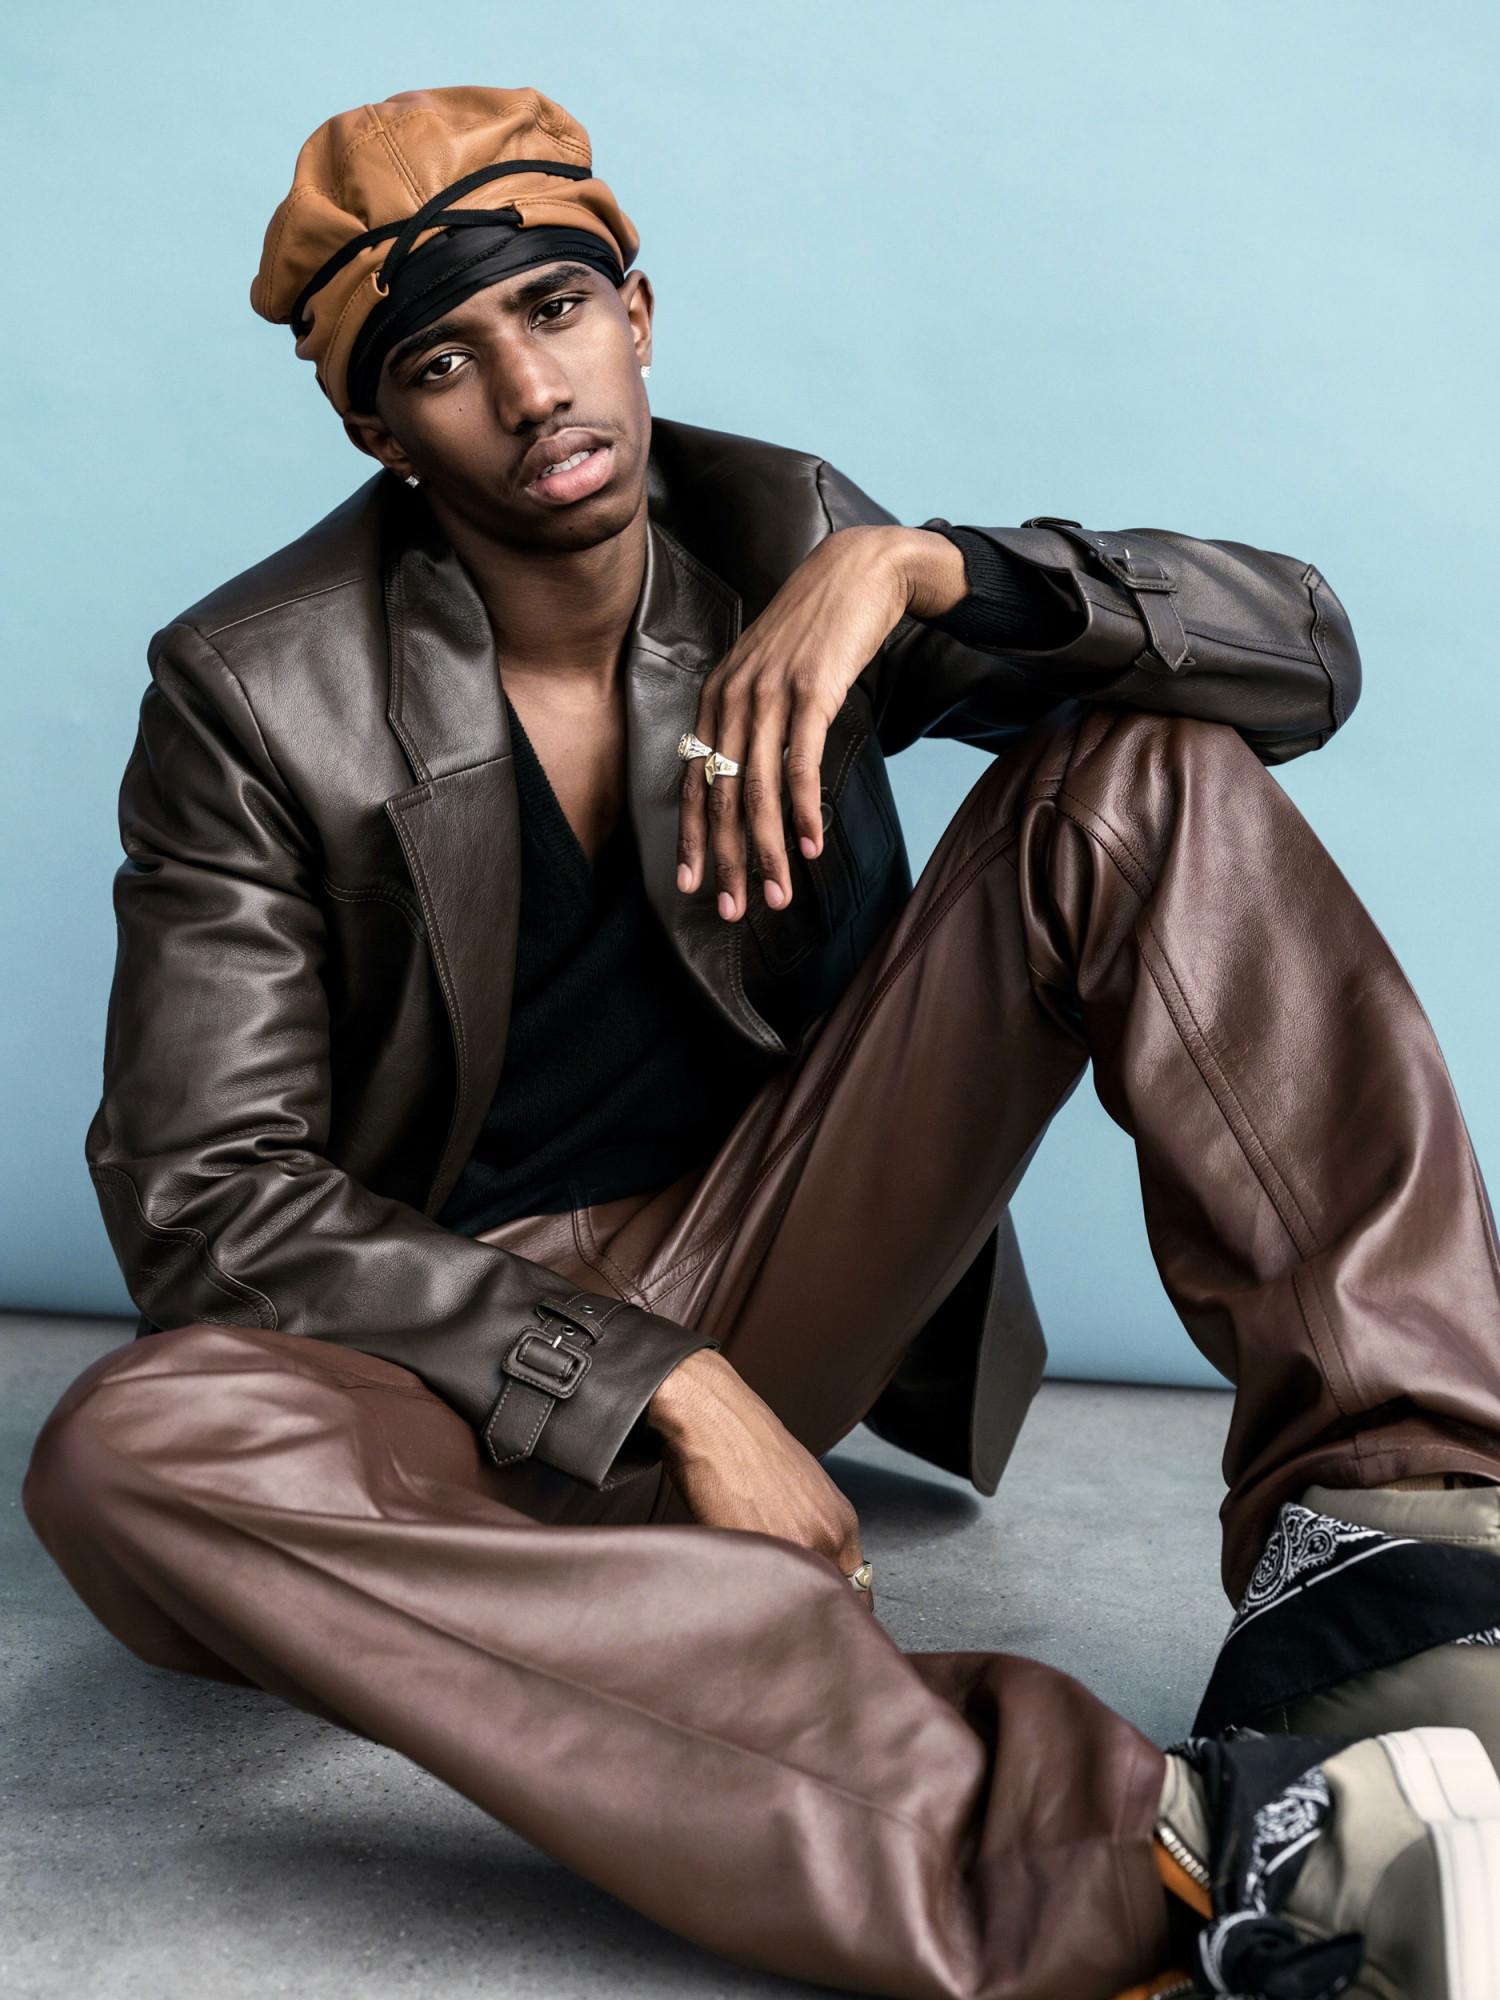 Bjorn Iooss L'Uomo Vogue - Christian Combs